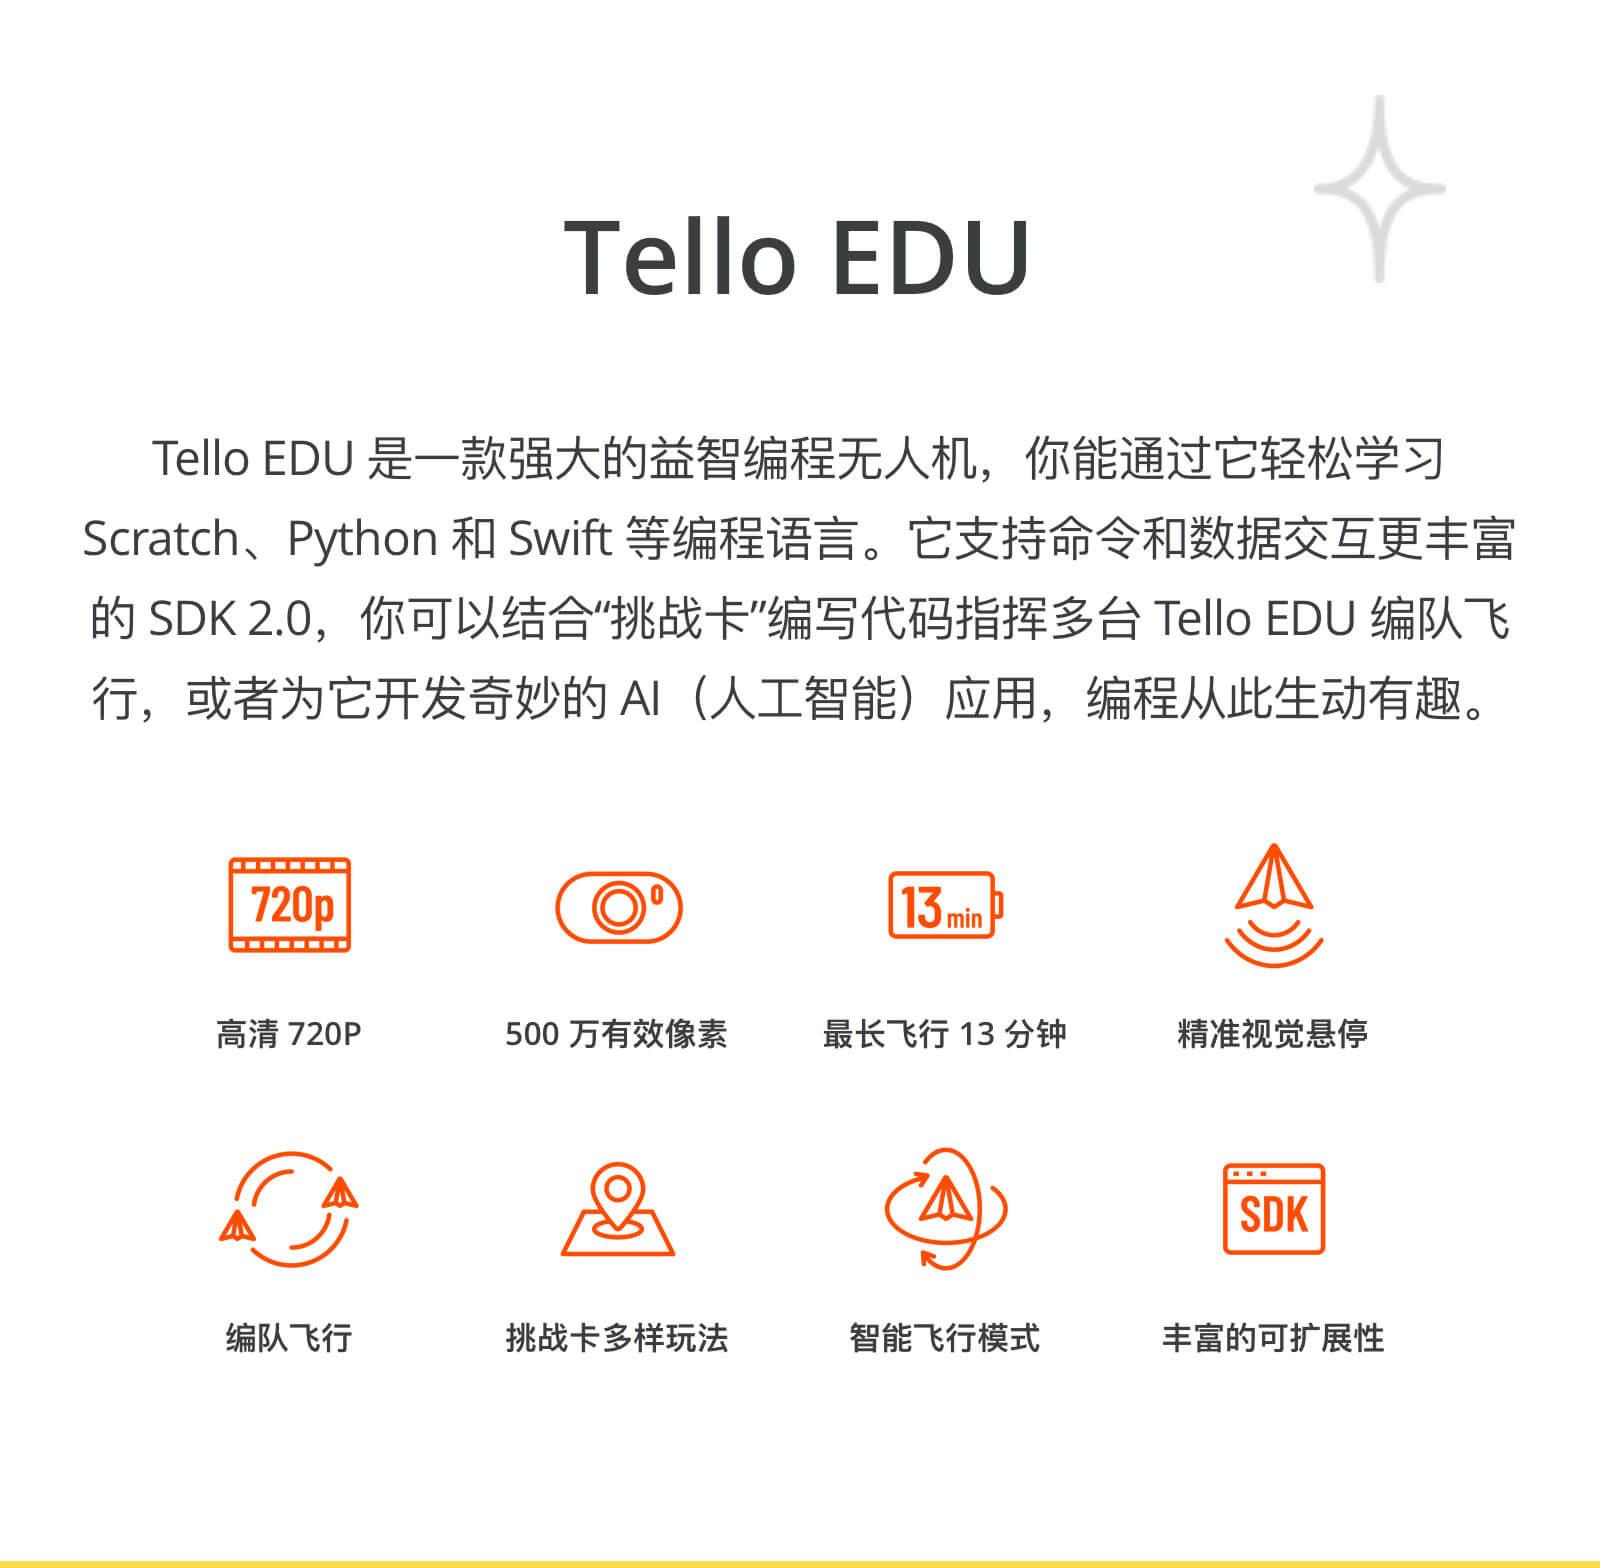 tello-edu-cn-m800-copy_02.jpg